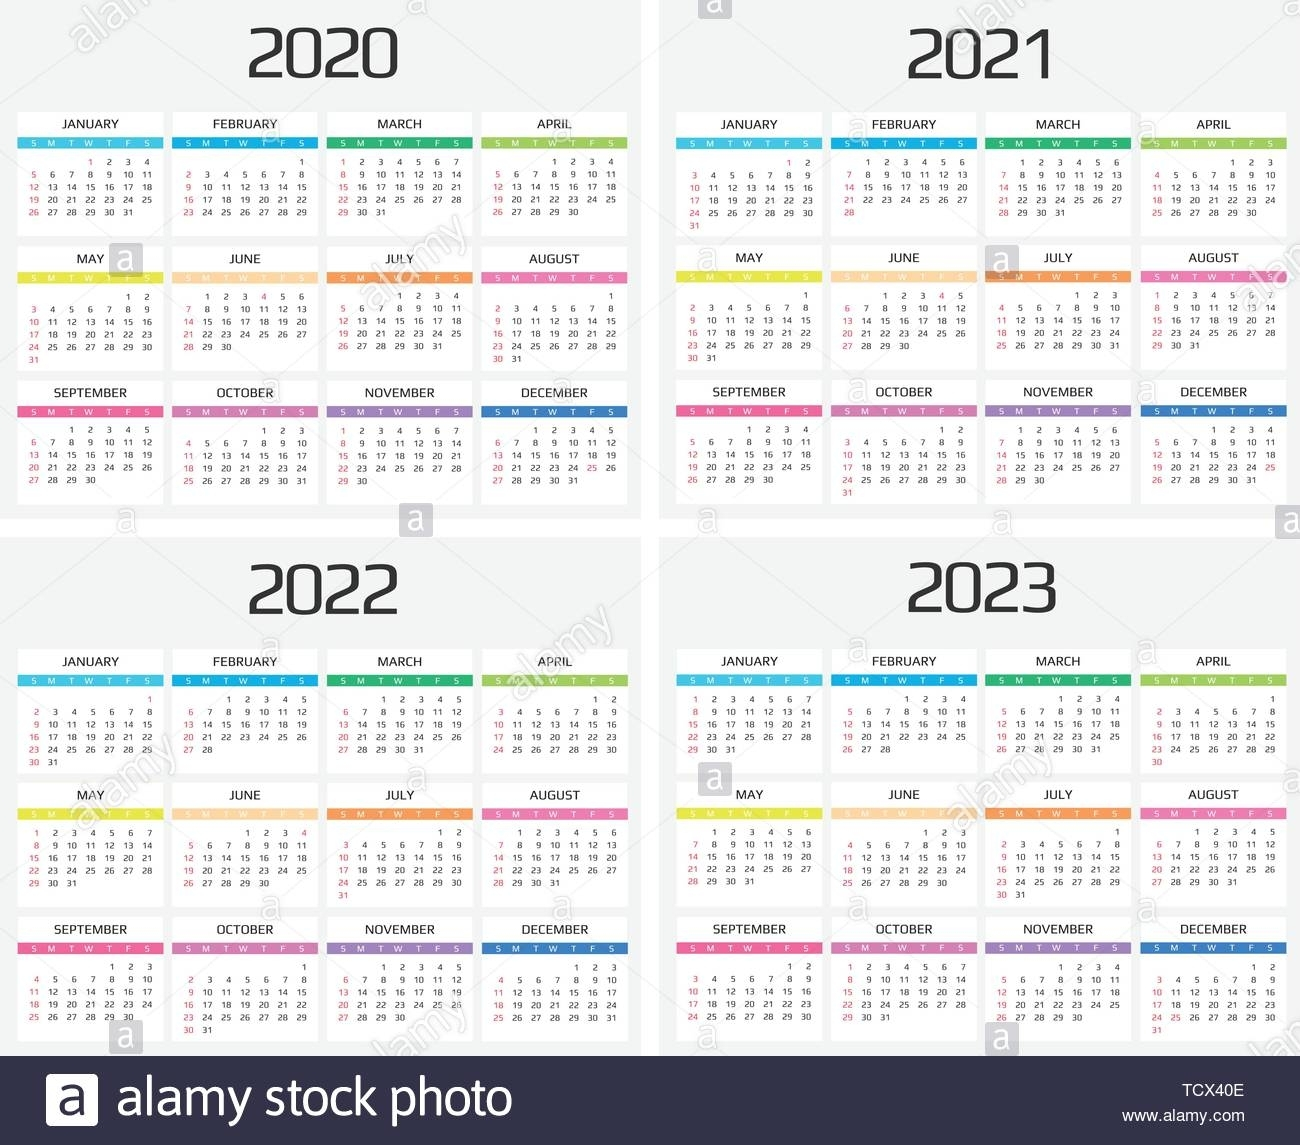 Calendar 2020, 2021, 2022, 2023 Template. 12 Months. Include